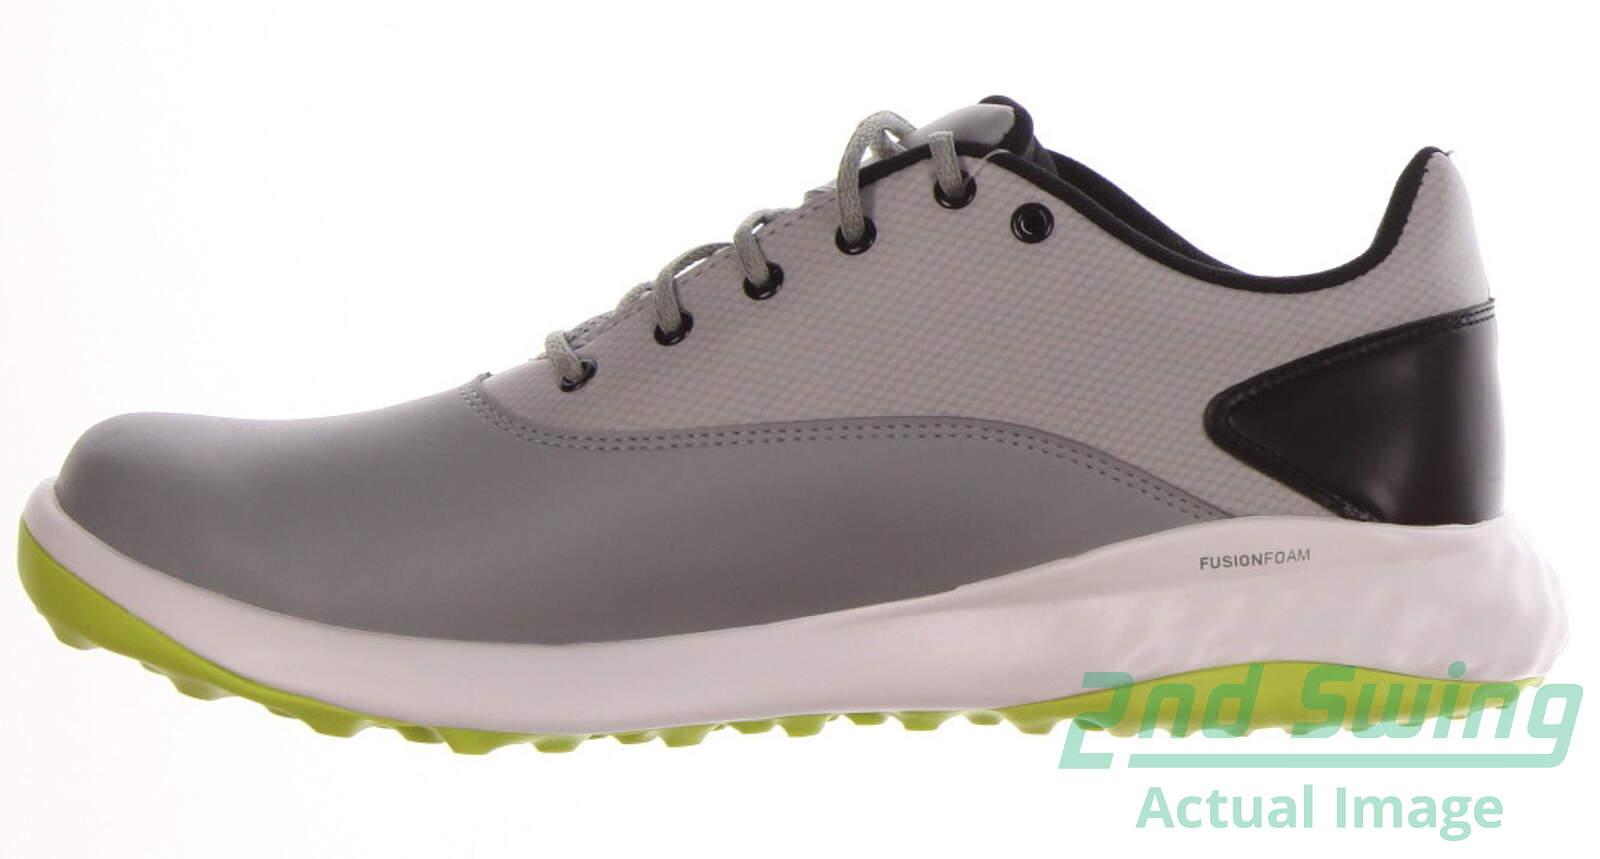 New Mens Golf Shoe Puma Grip Fusion Medium 8 Gray MSRP  80 - Golf Footwear   885be91fbec